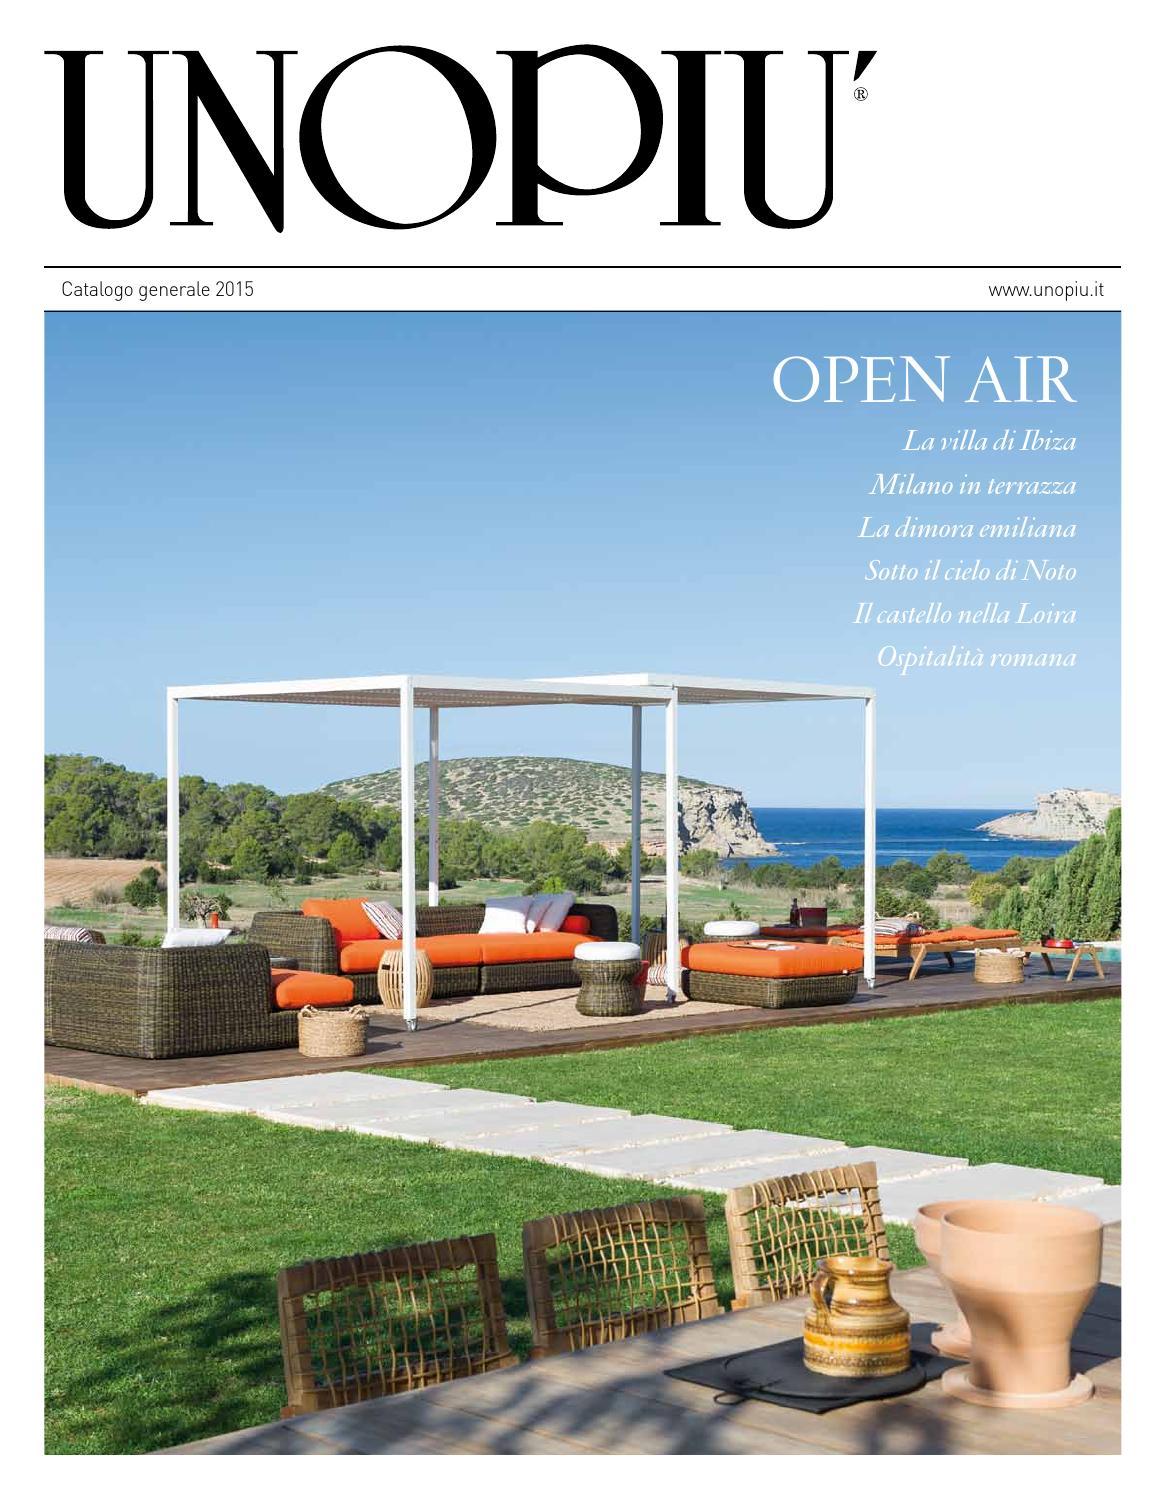 unopi catalogo generale 2015 by unopi spa issuu On catalogo unopiu